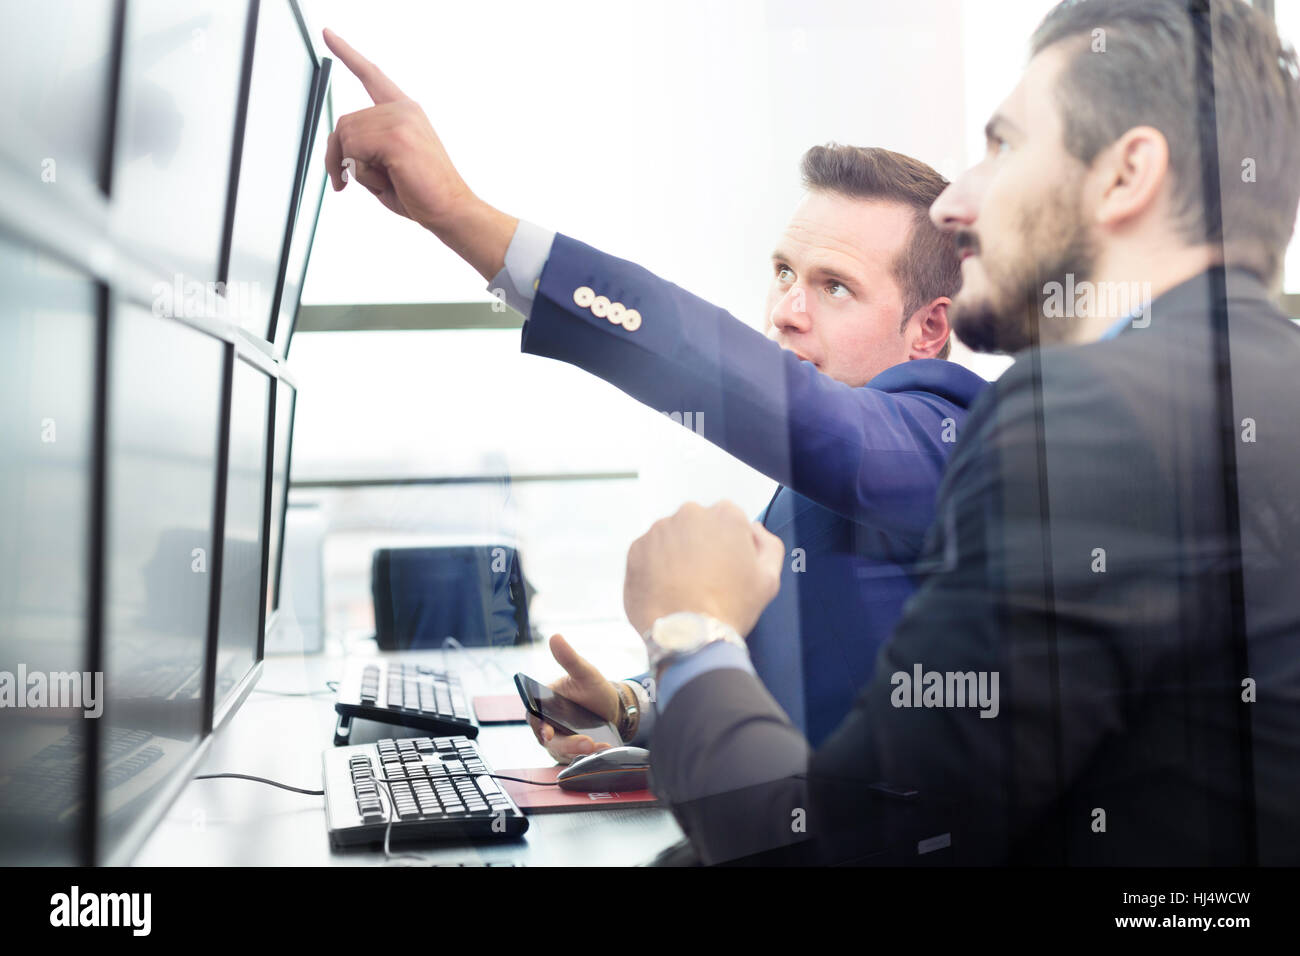 Stock Traders mirando pantallas de ordenador. Imagen De Stock